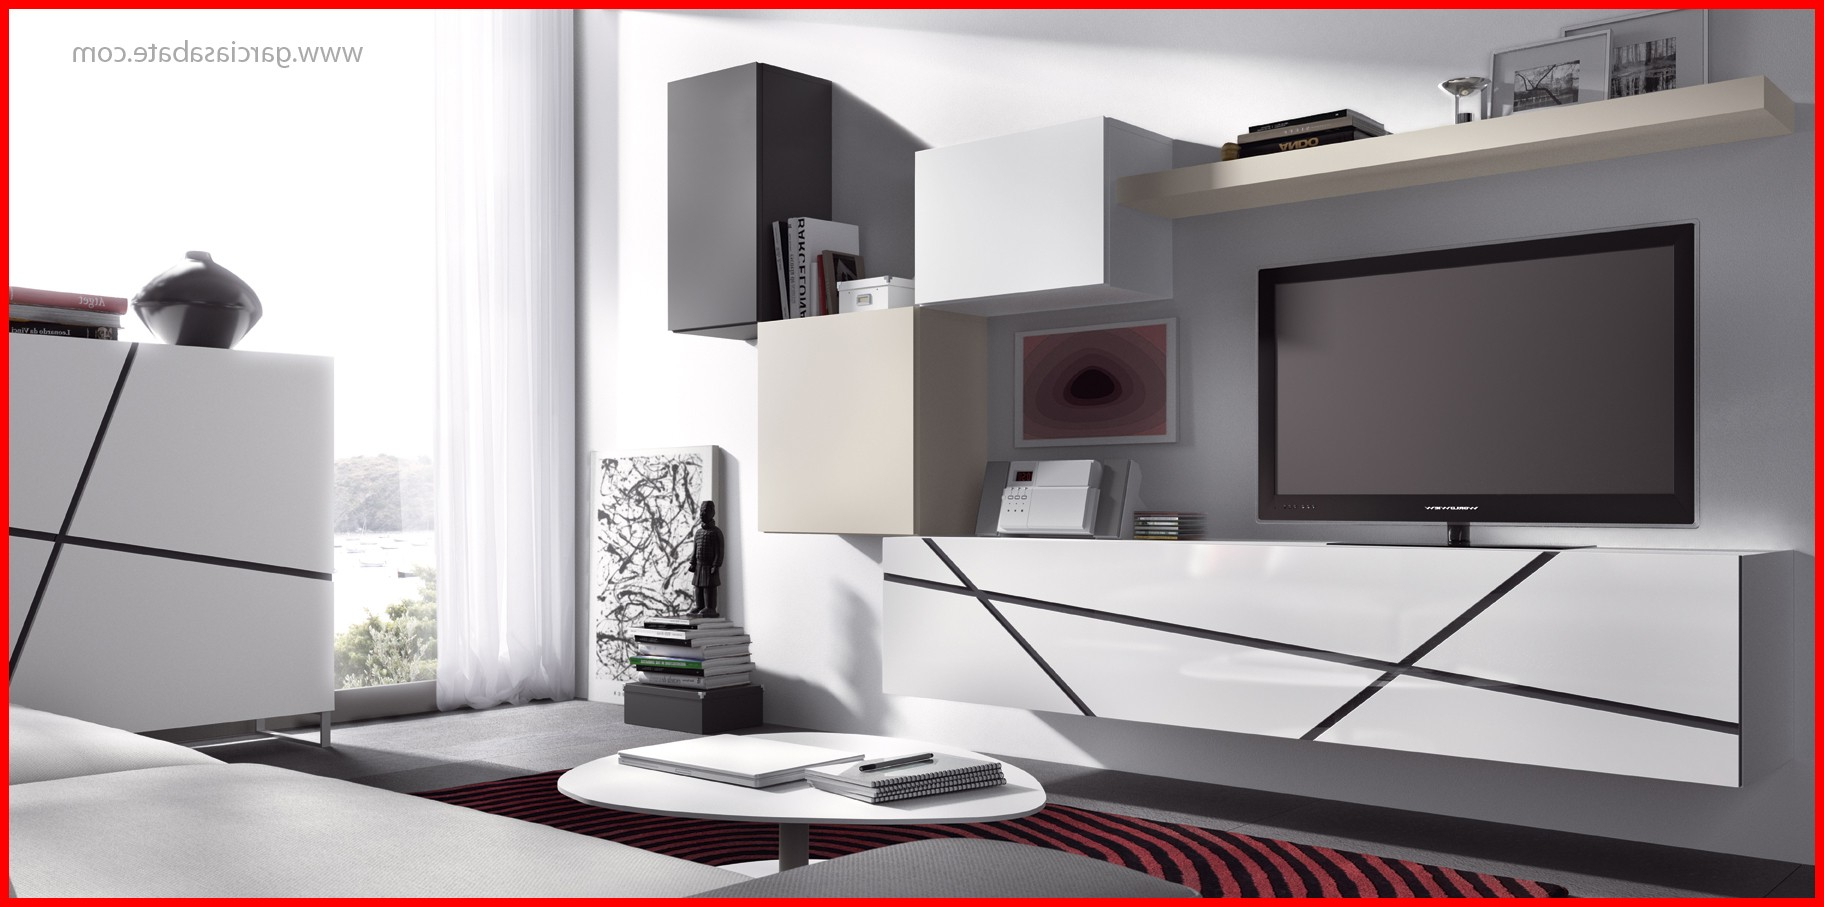 Muebles España J7do Fabricantes De Muebles De Salon Fabricantes De Muebles